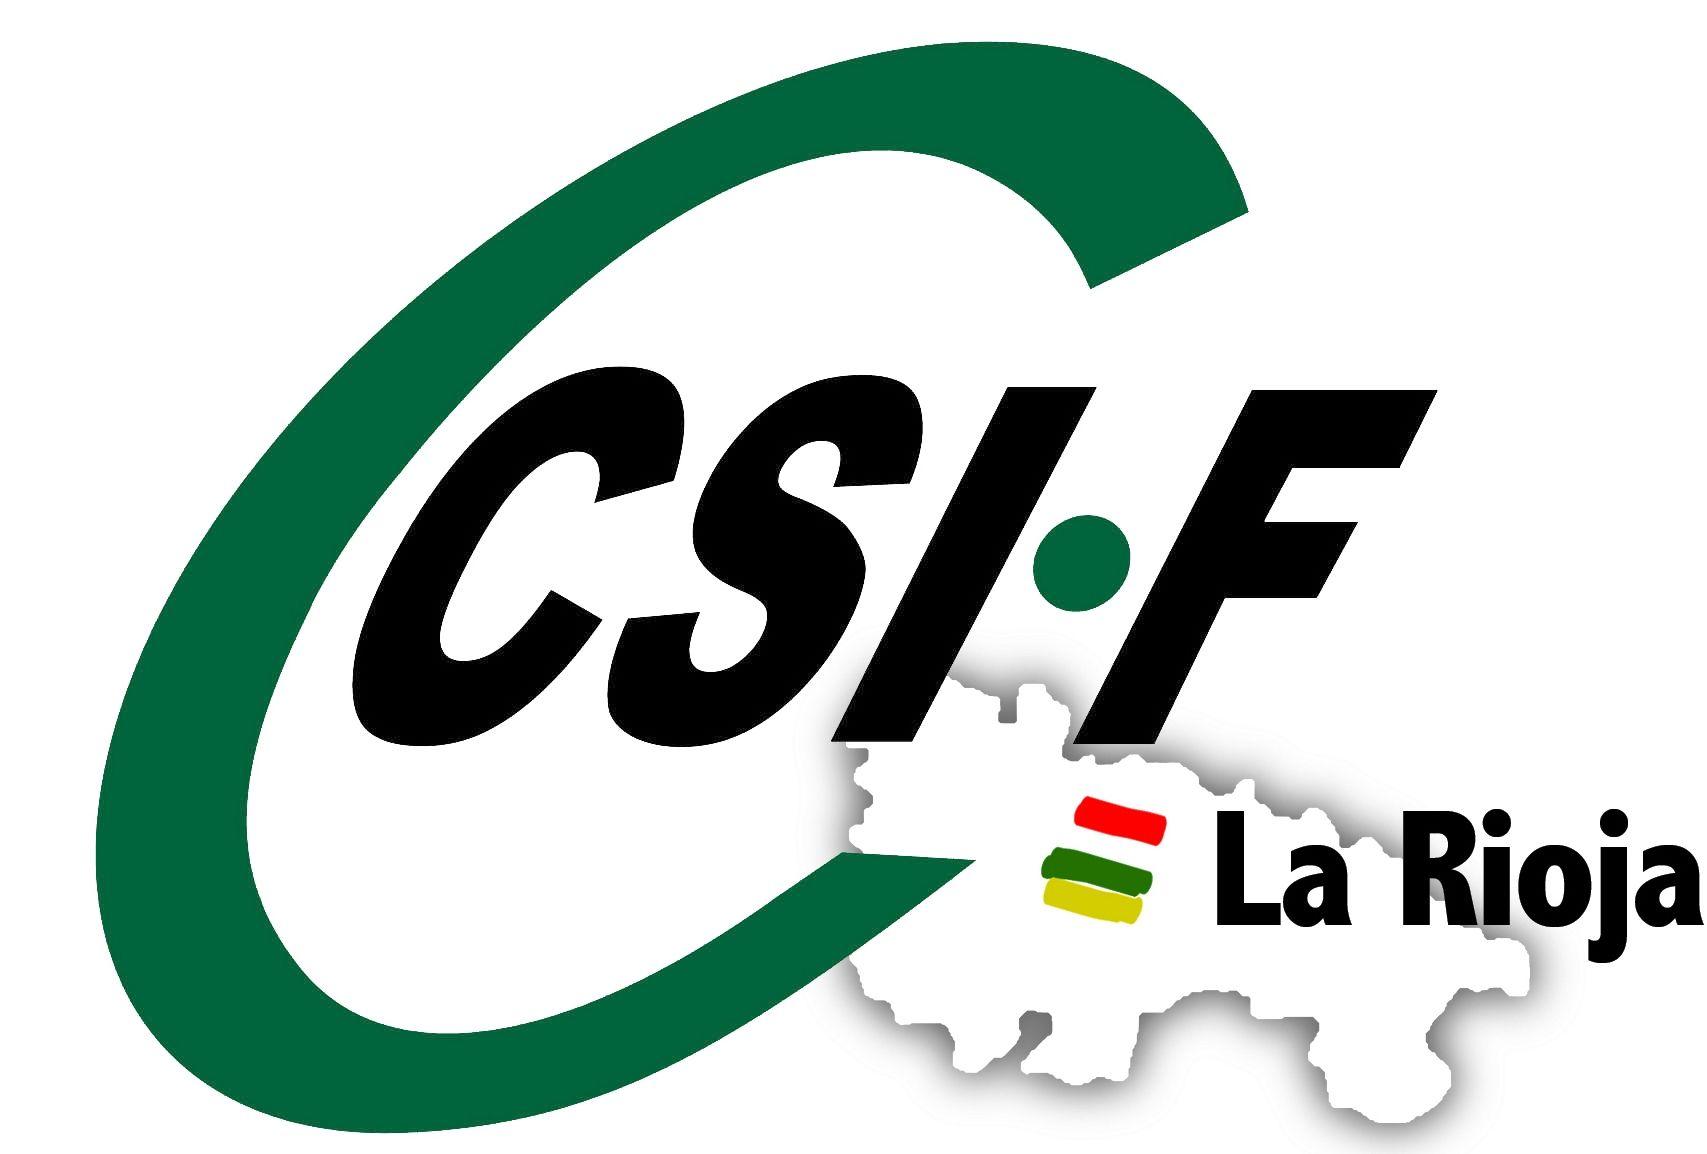 Nuevo acuerdo del parque con CSIF La Rioja